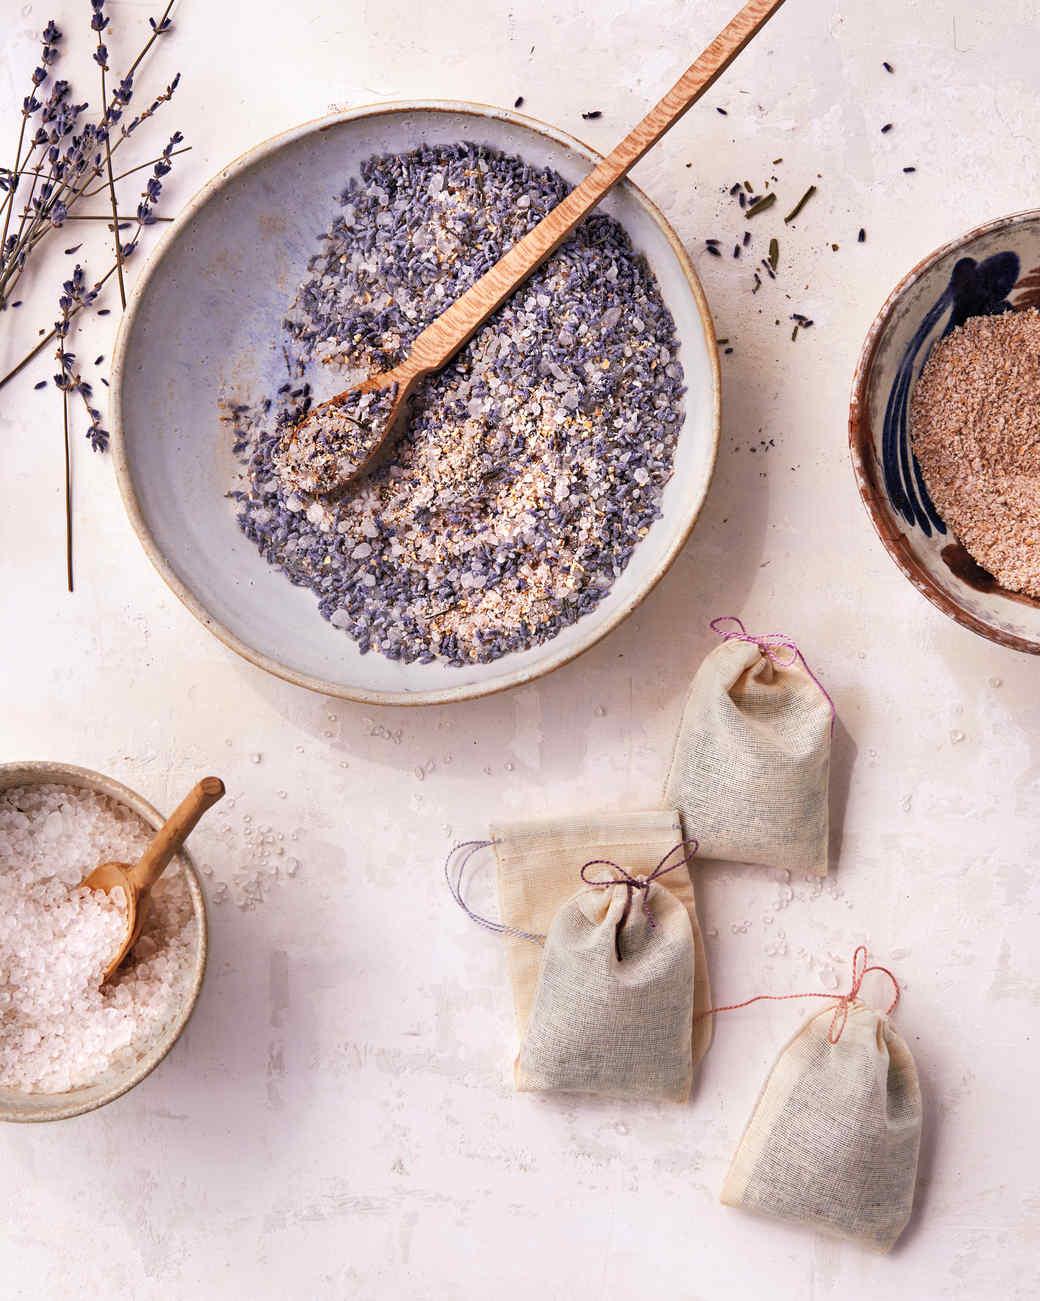 lavender-tub-teas-093-d111166.jpg